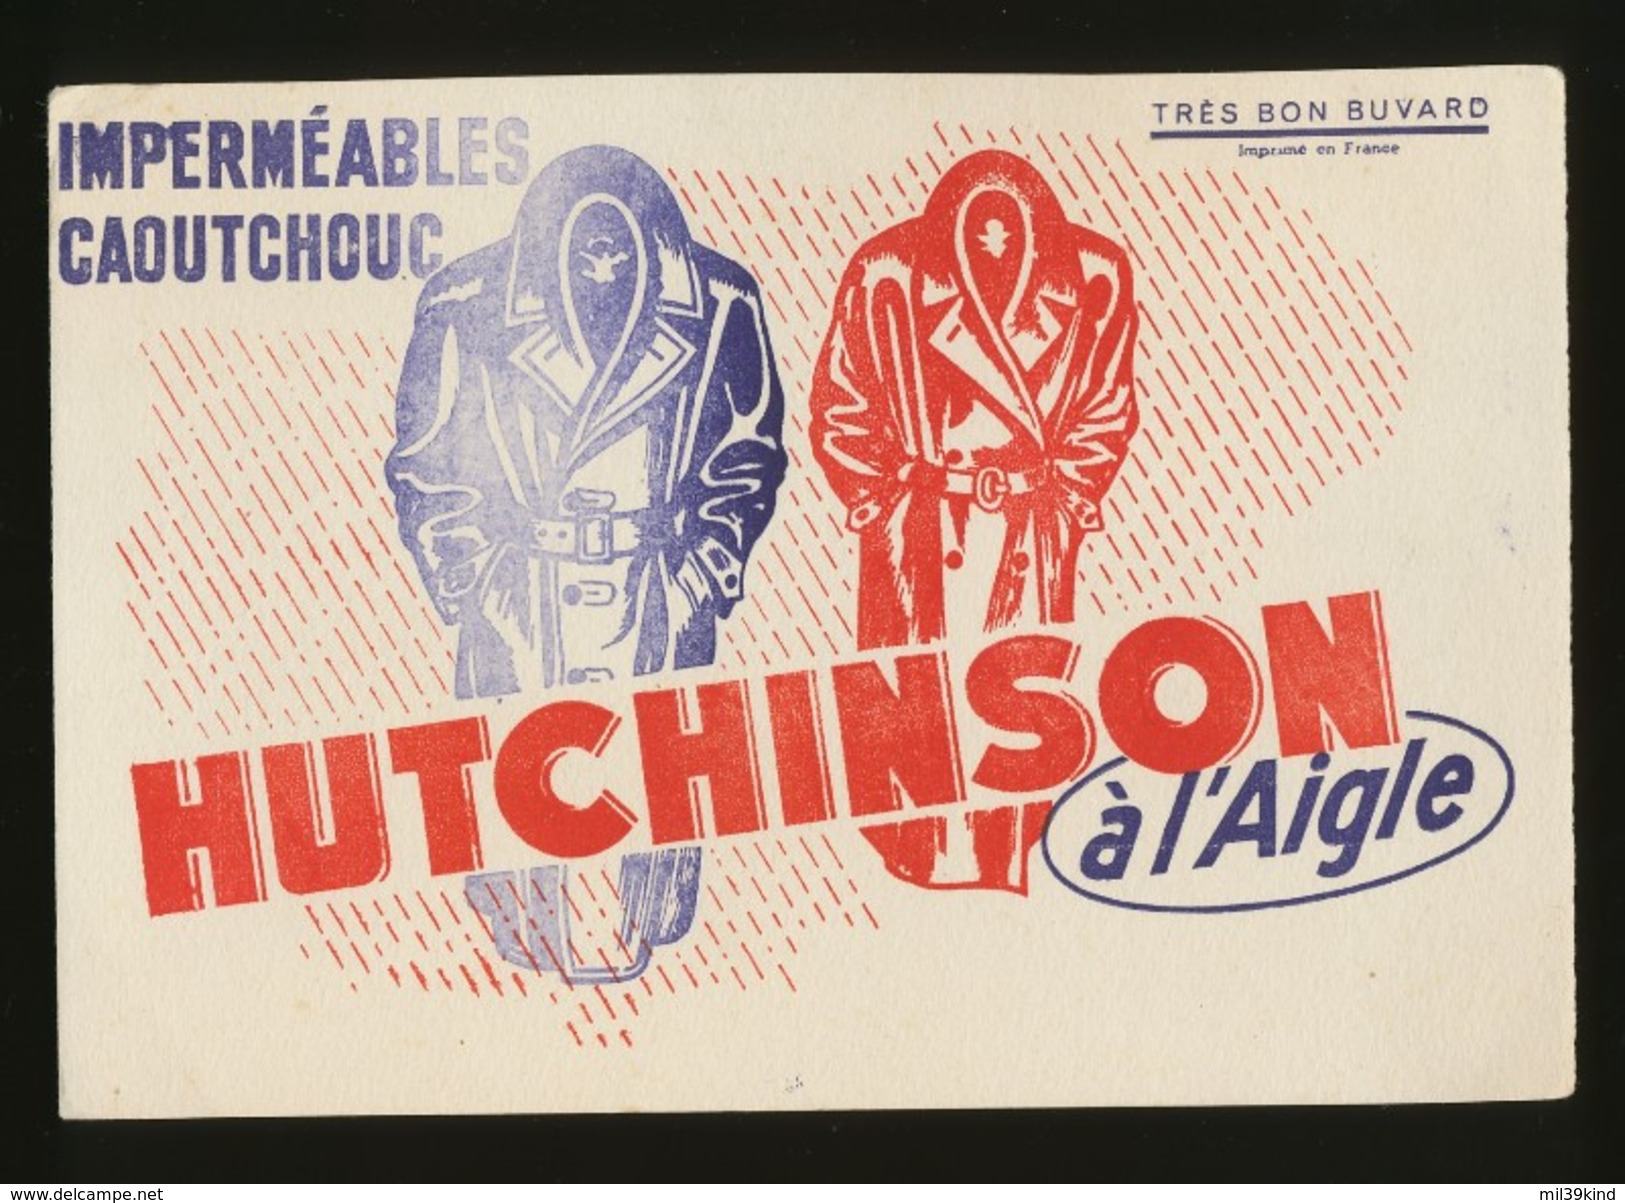 Buvard - HUTCHINSON - à L'aigle - H